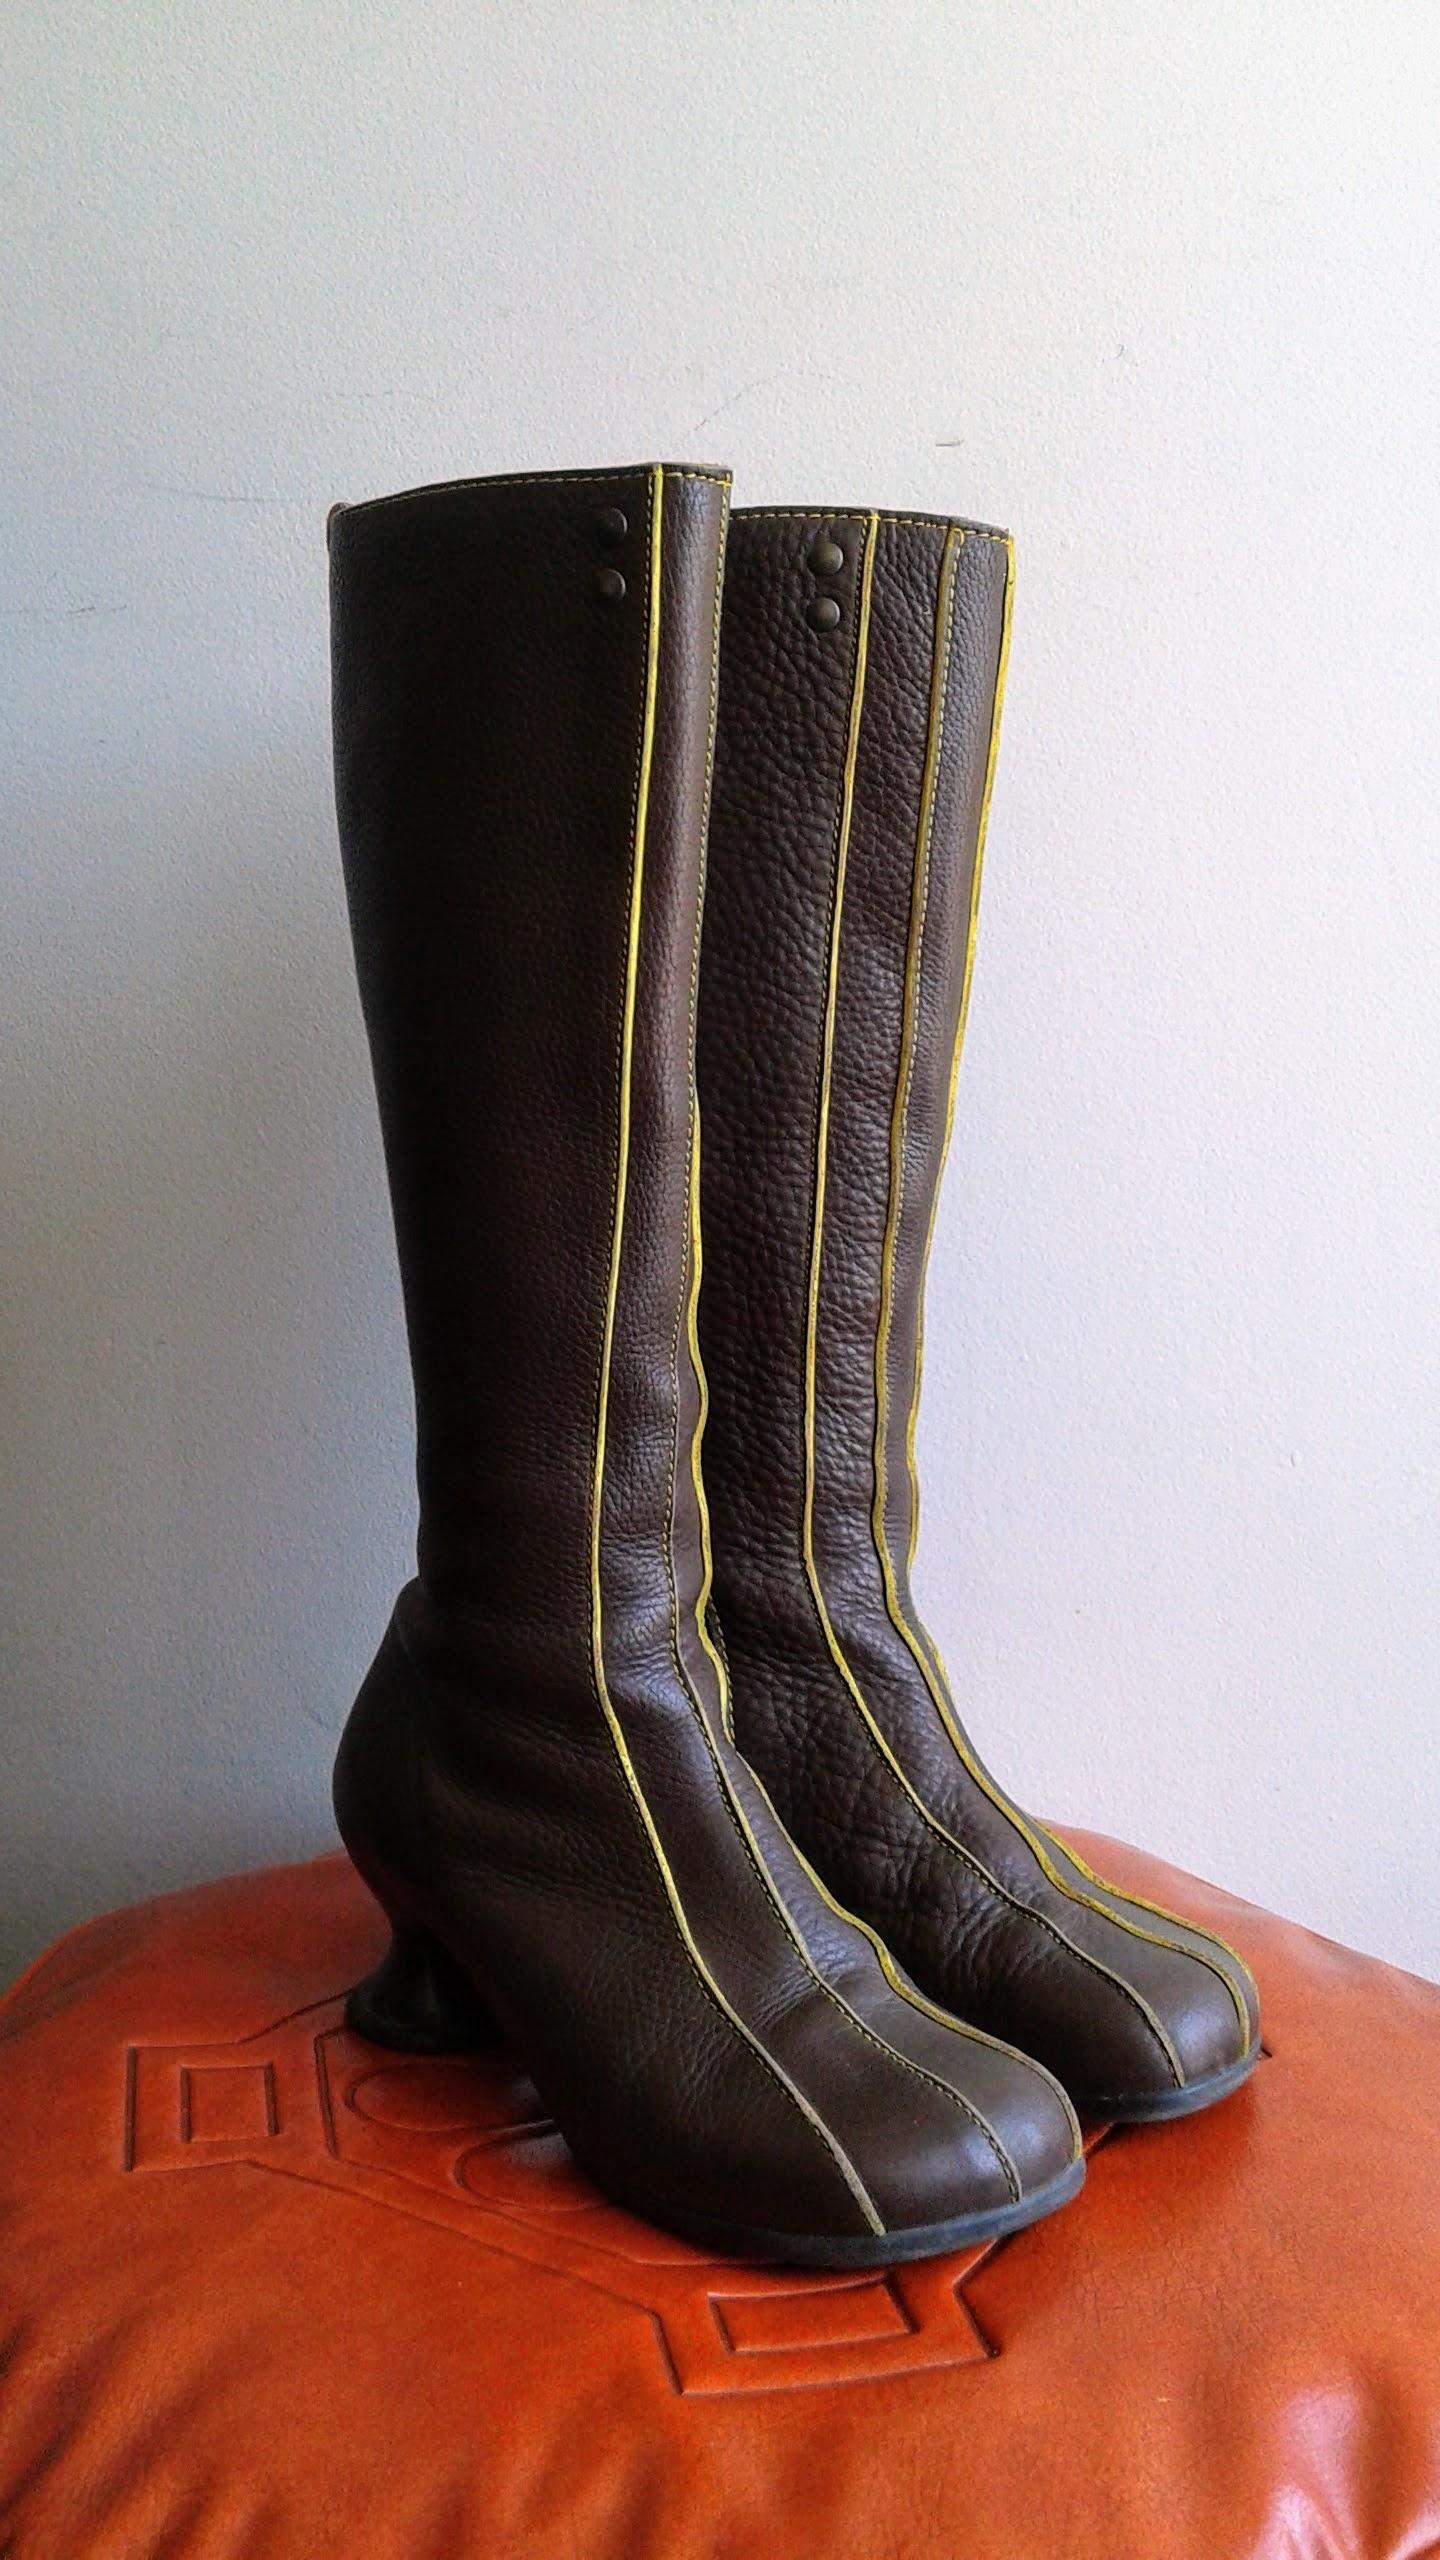 Fluevog boots; S7, $110